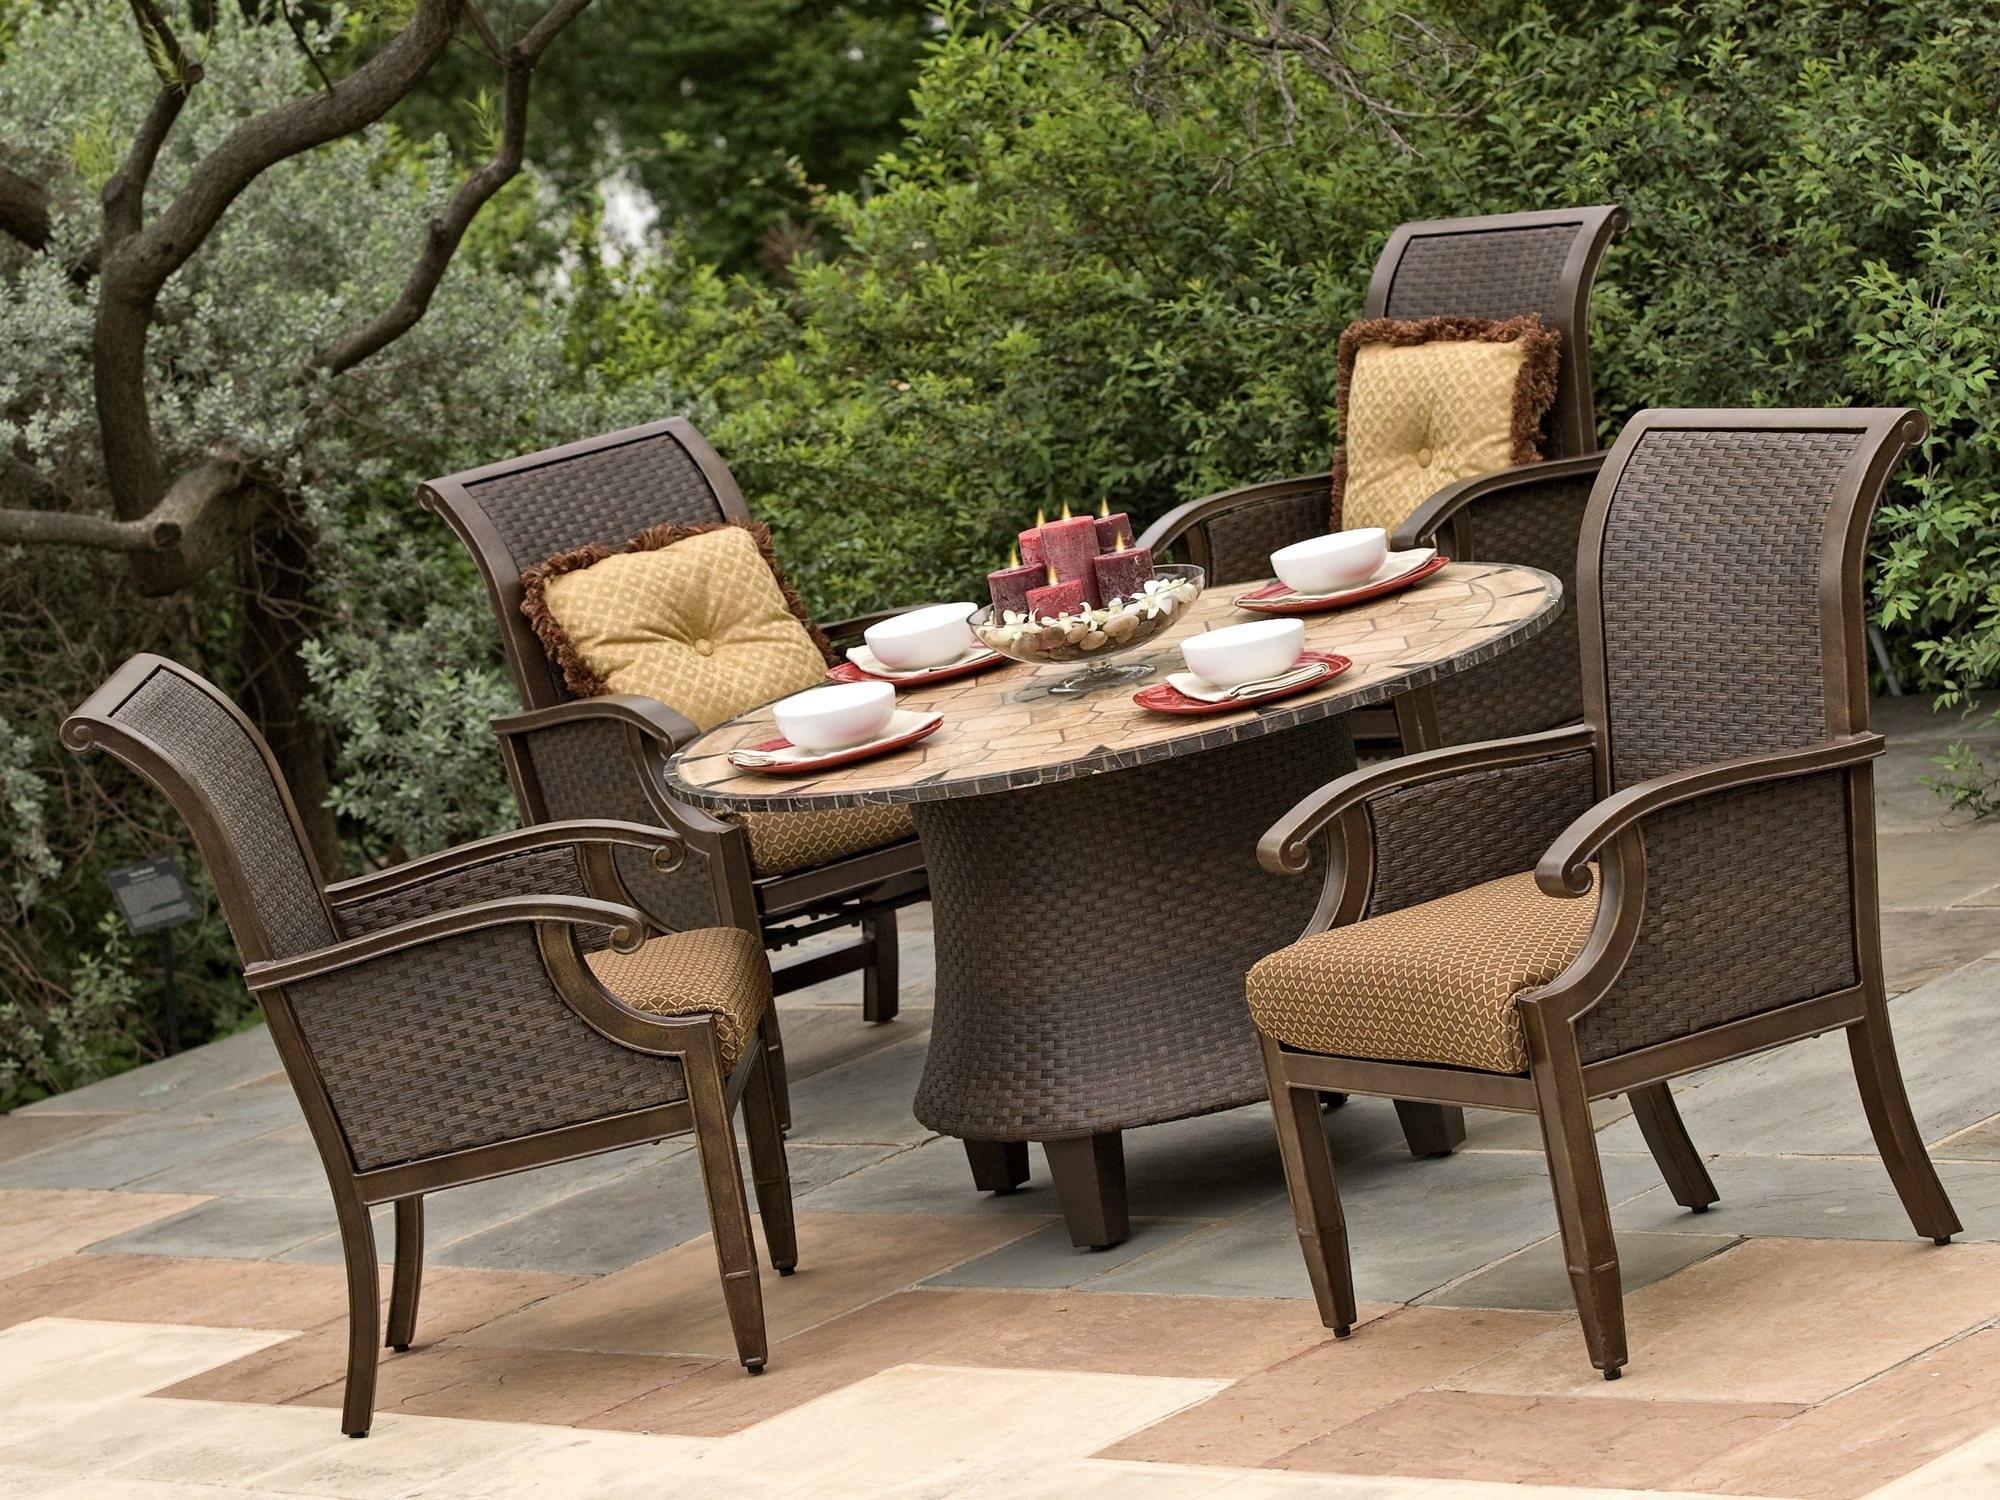 Furniture Fabulous Outdoor Patio Resin Wicker Rattan inside sizing 2000 X 1500